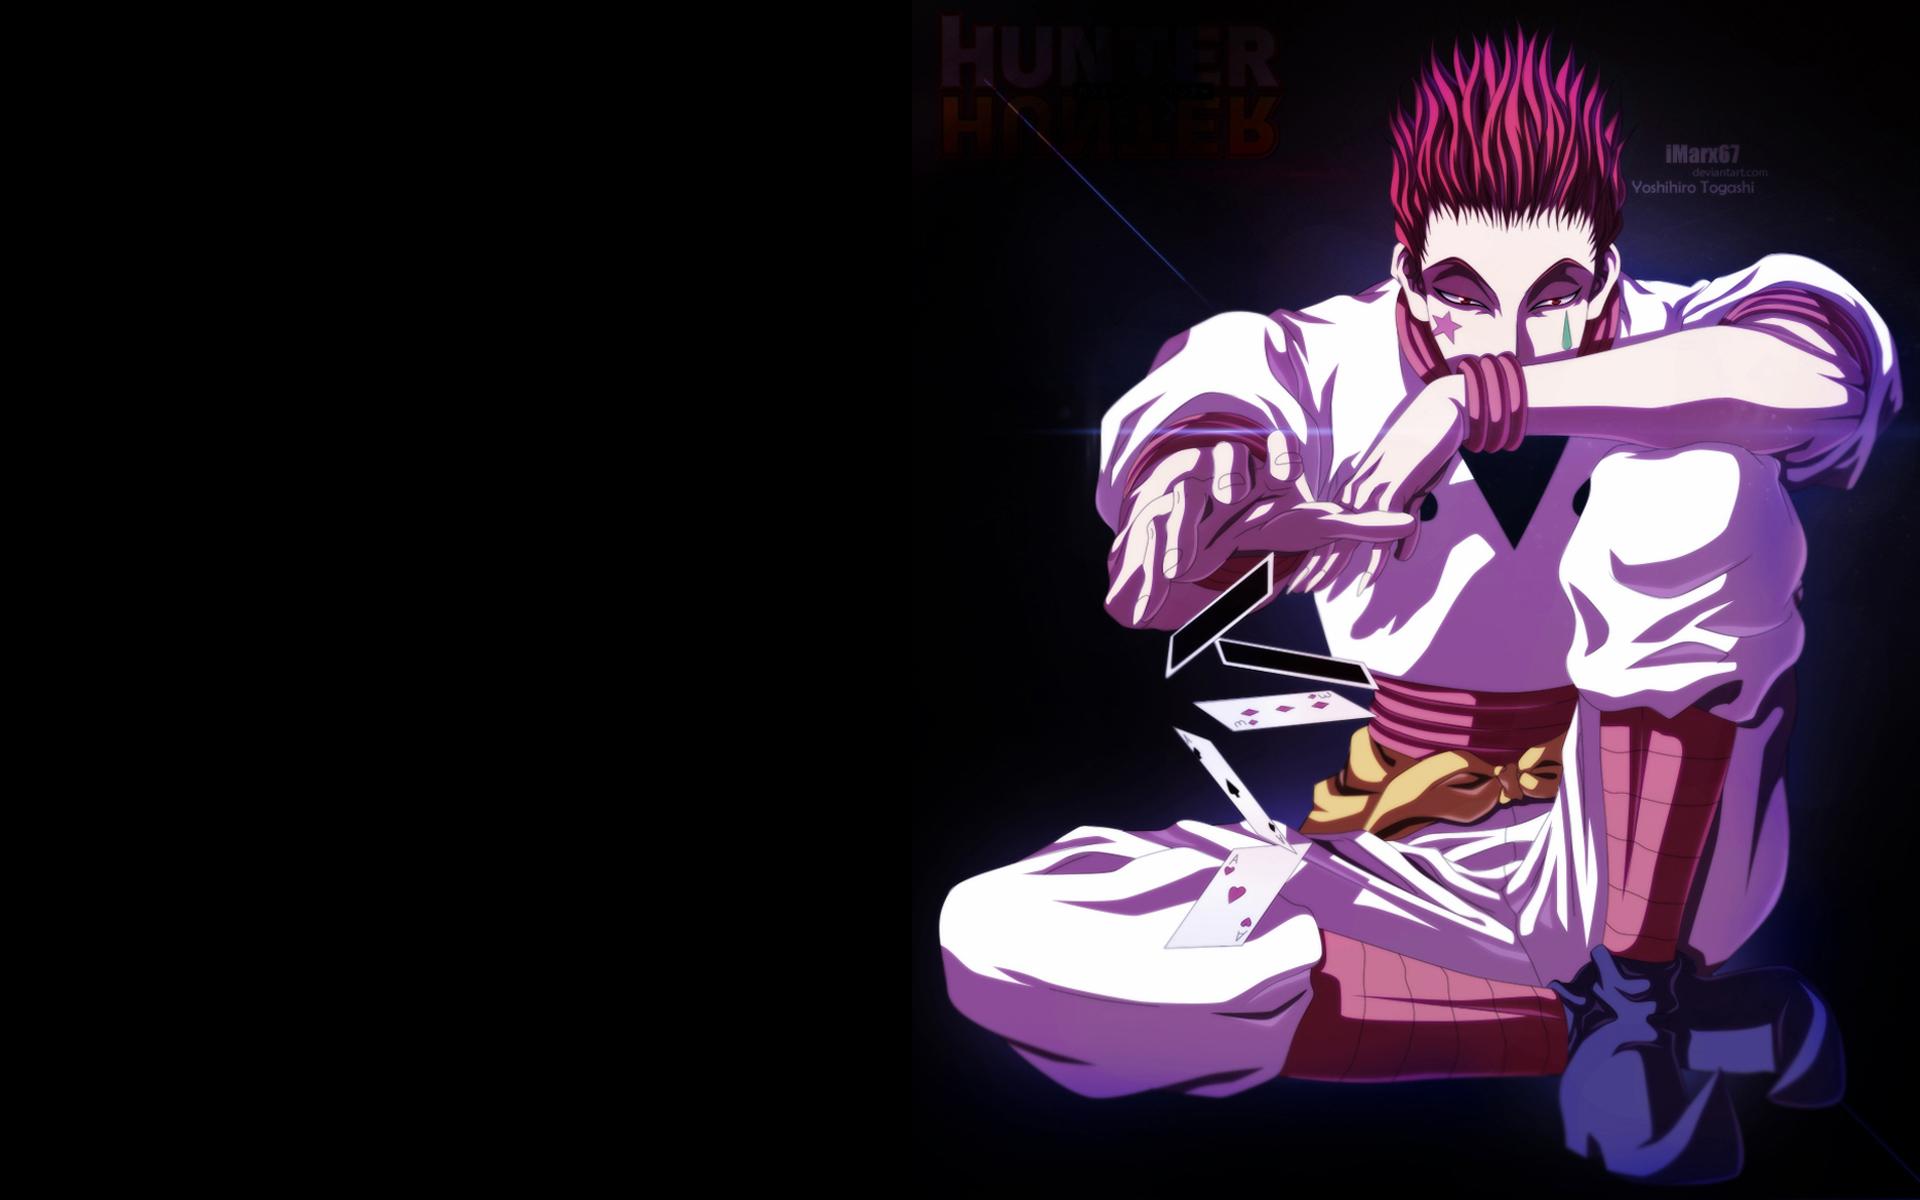 Fonds d'écran Manga Hunter x Hunter hunter x hunter